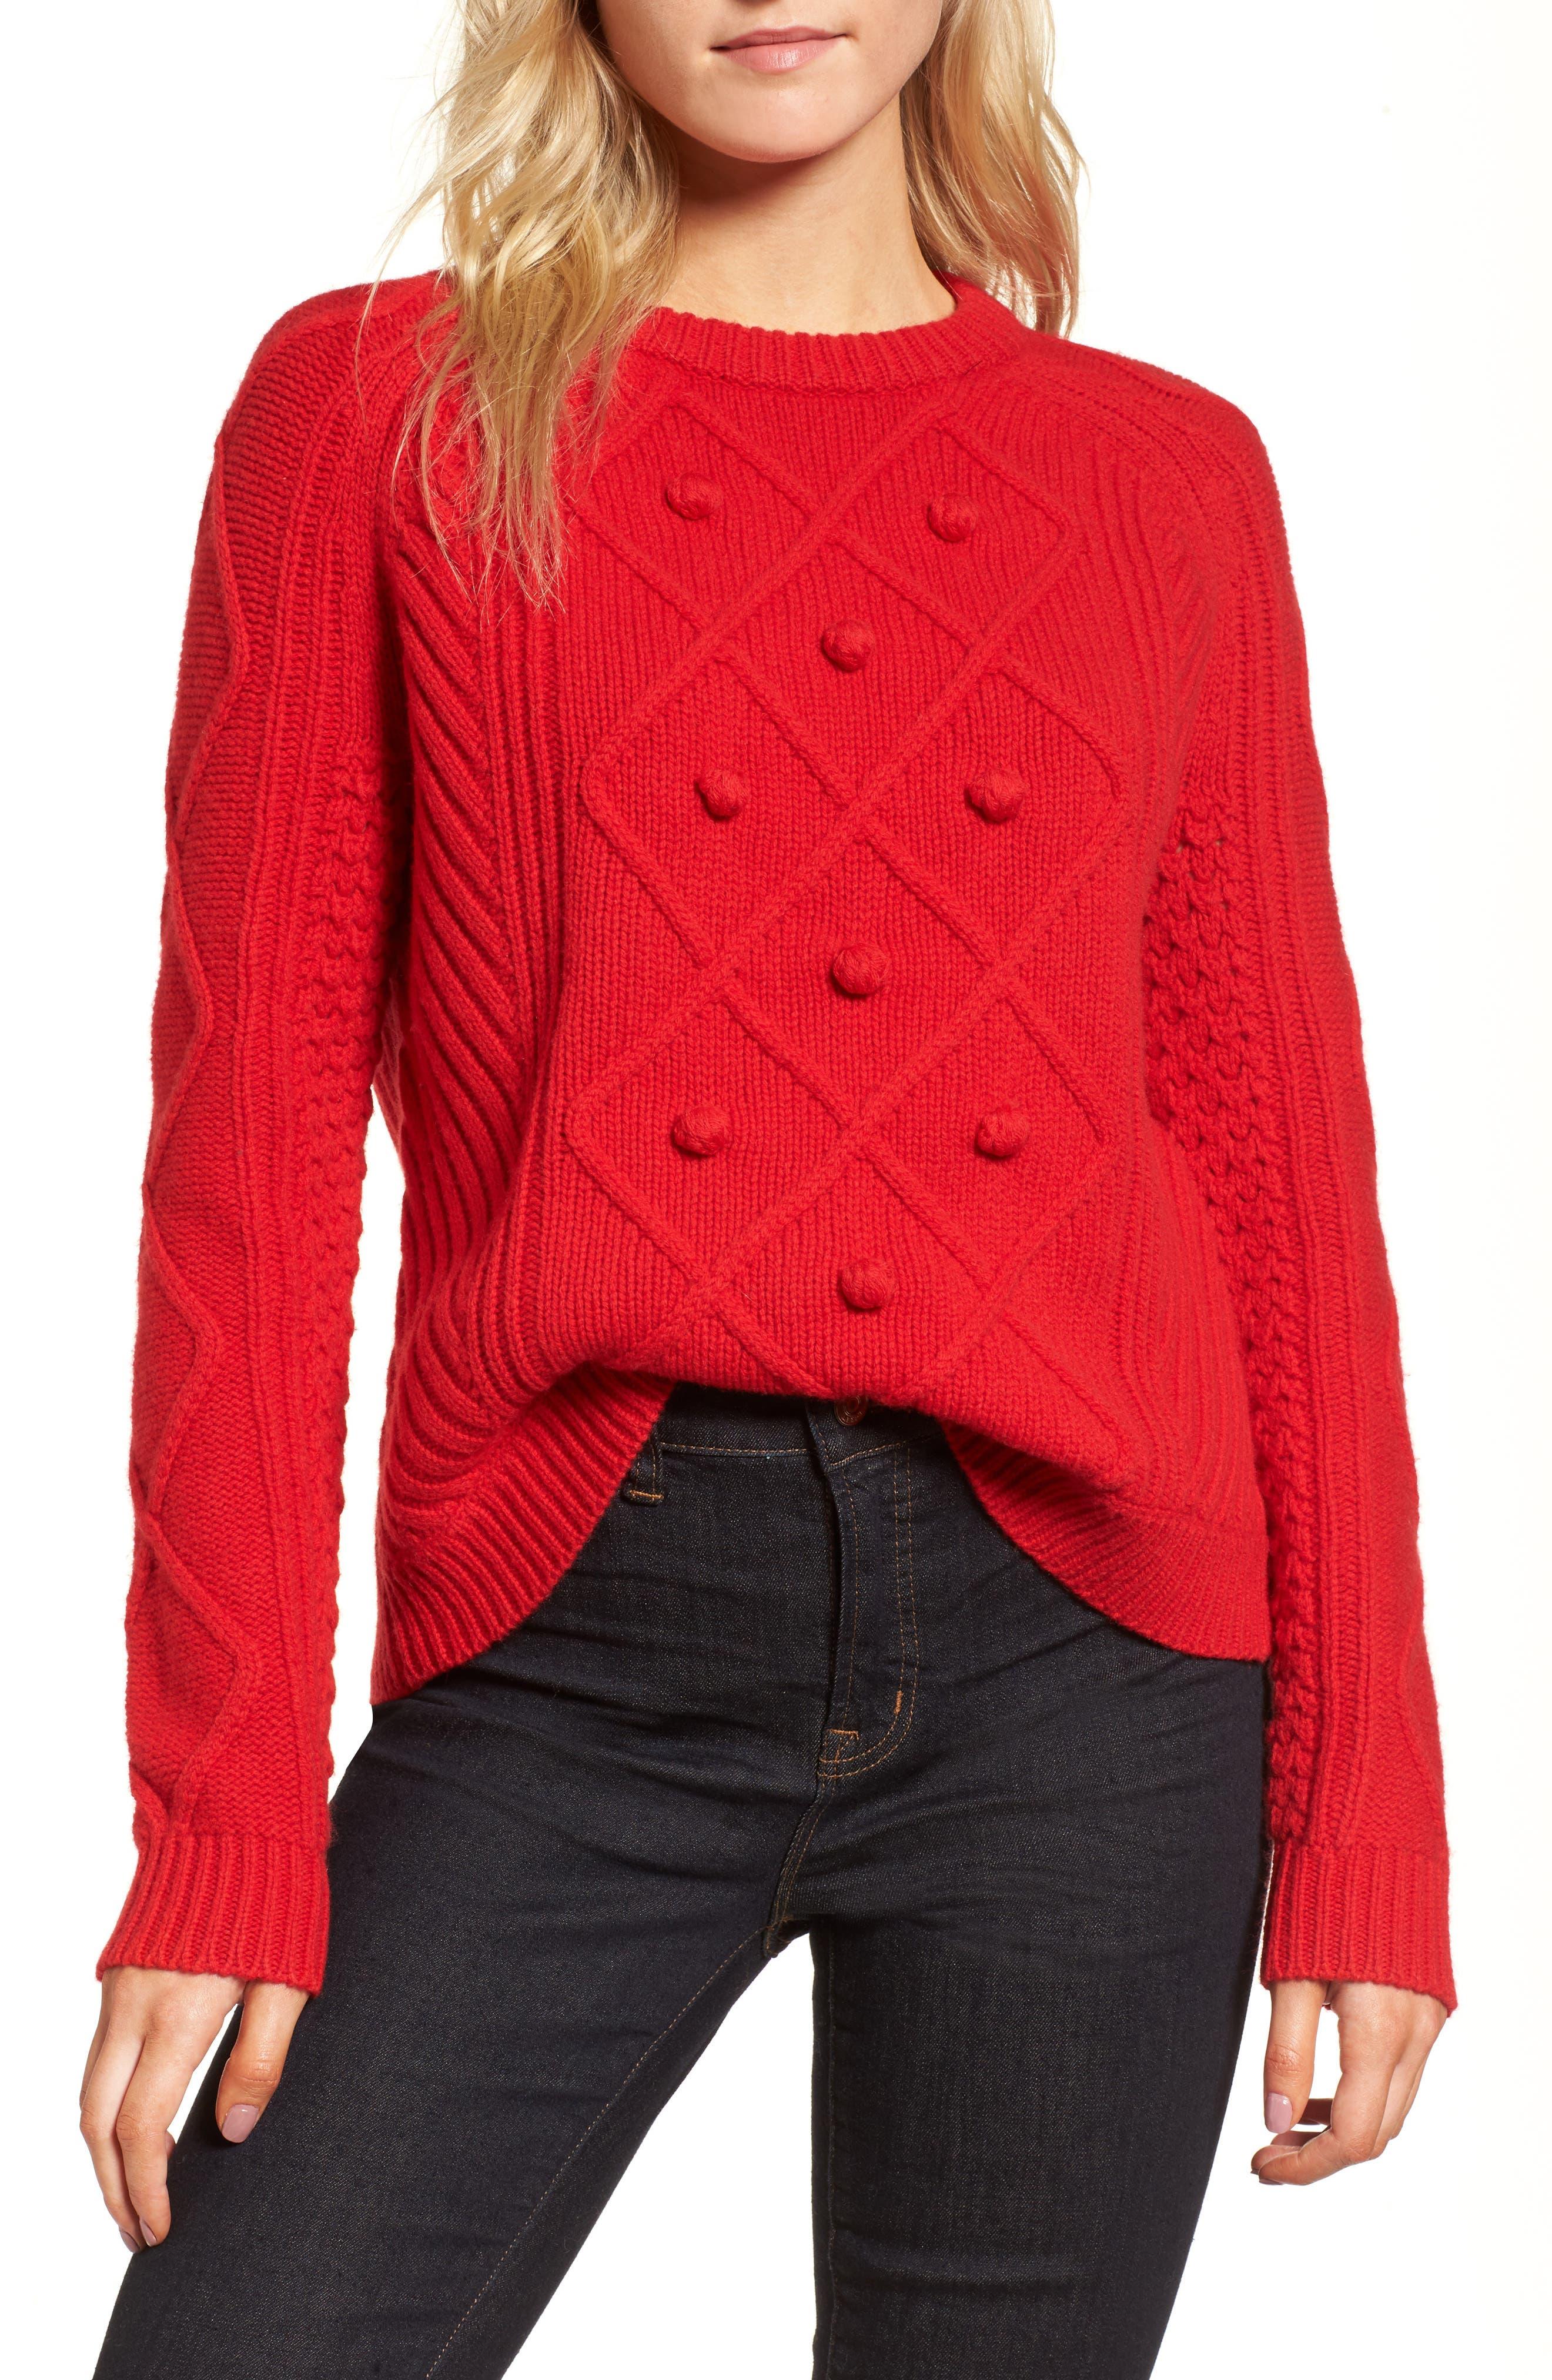 J.Crew Merino Wool Cable Pompom Sweater